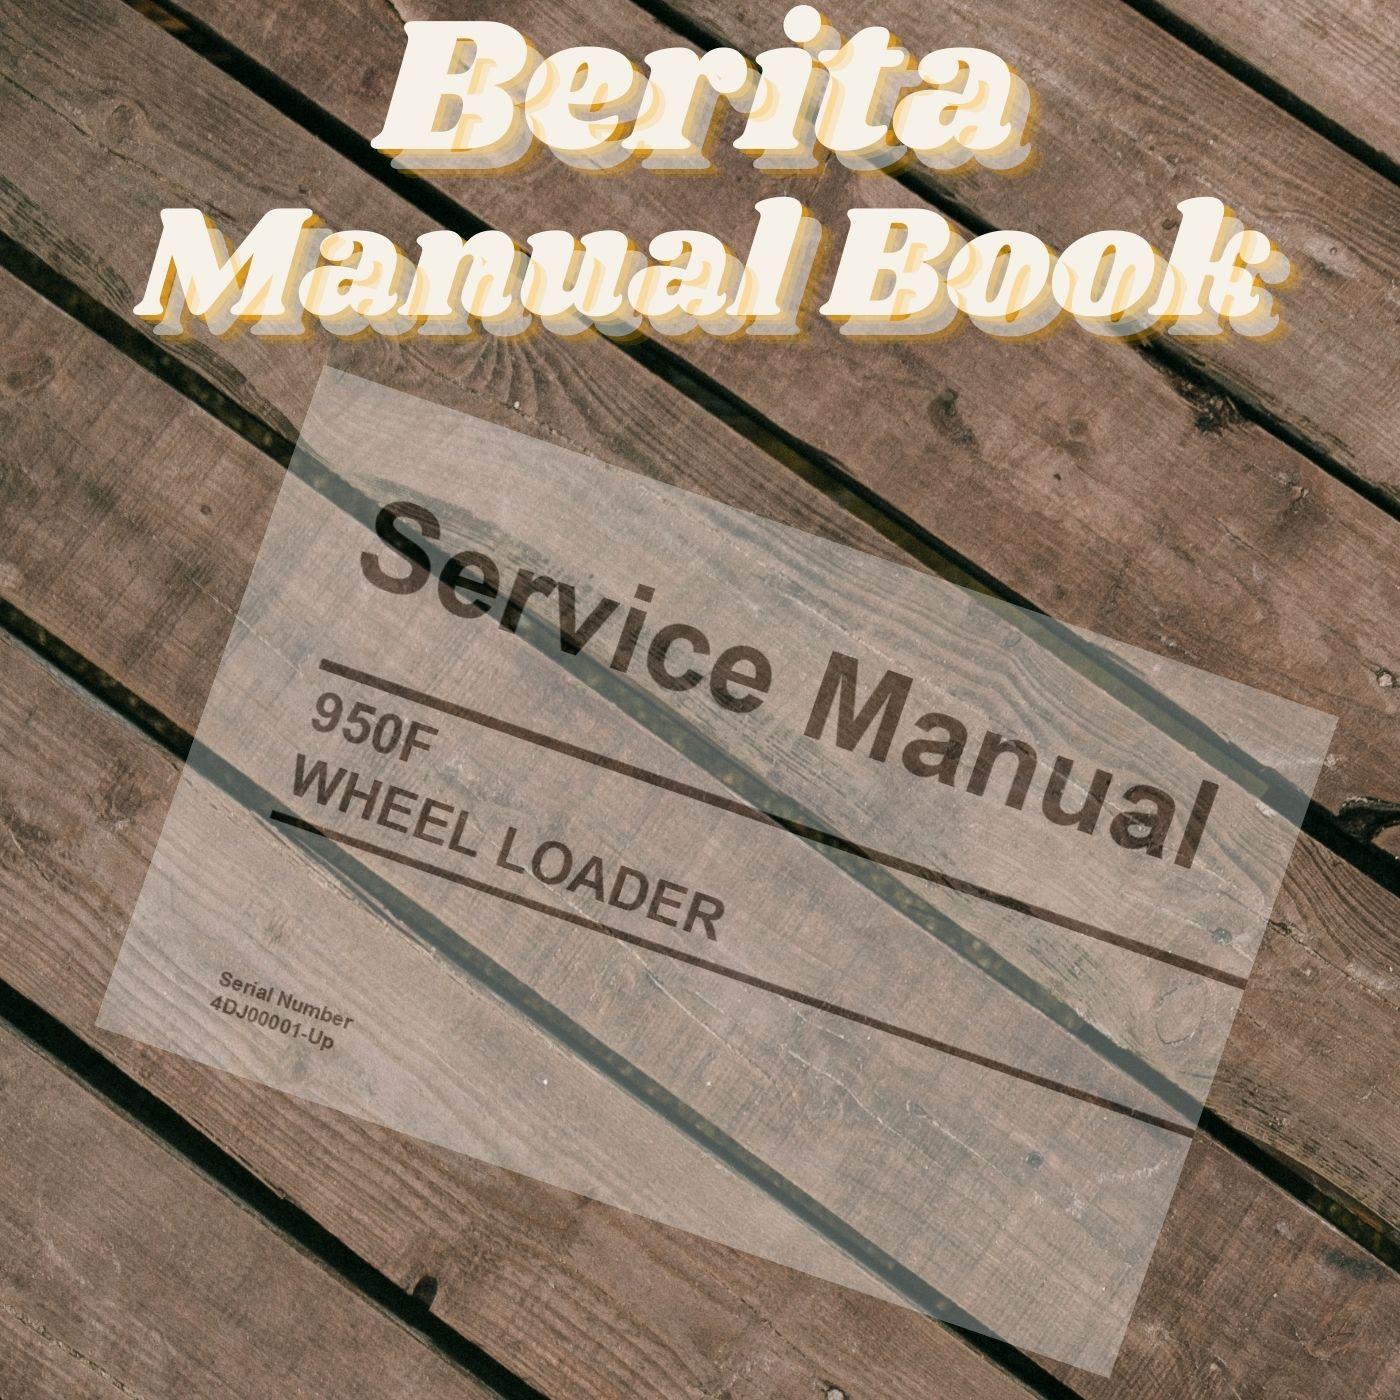 Cat 950F caterpillar wheel loader service manual